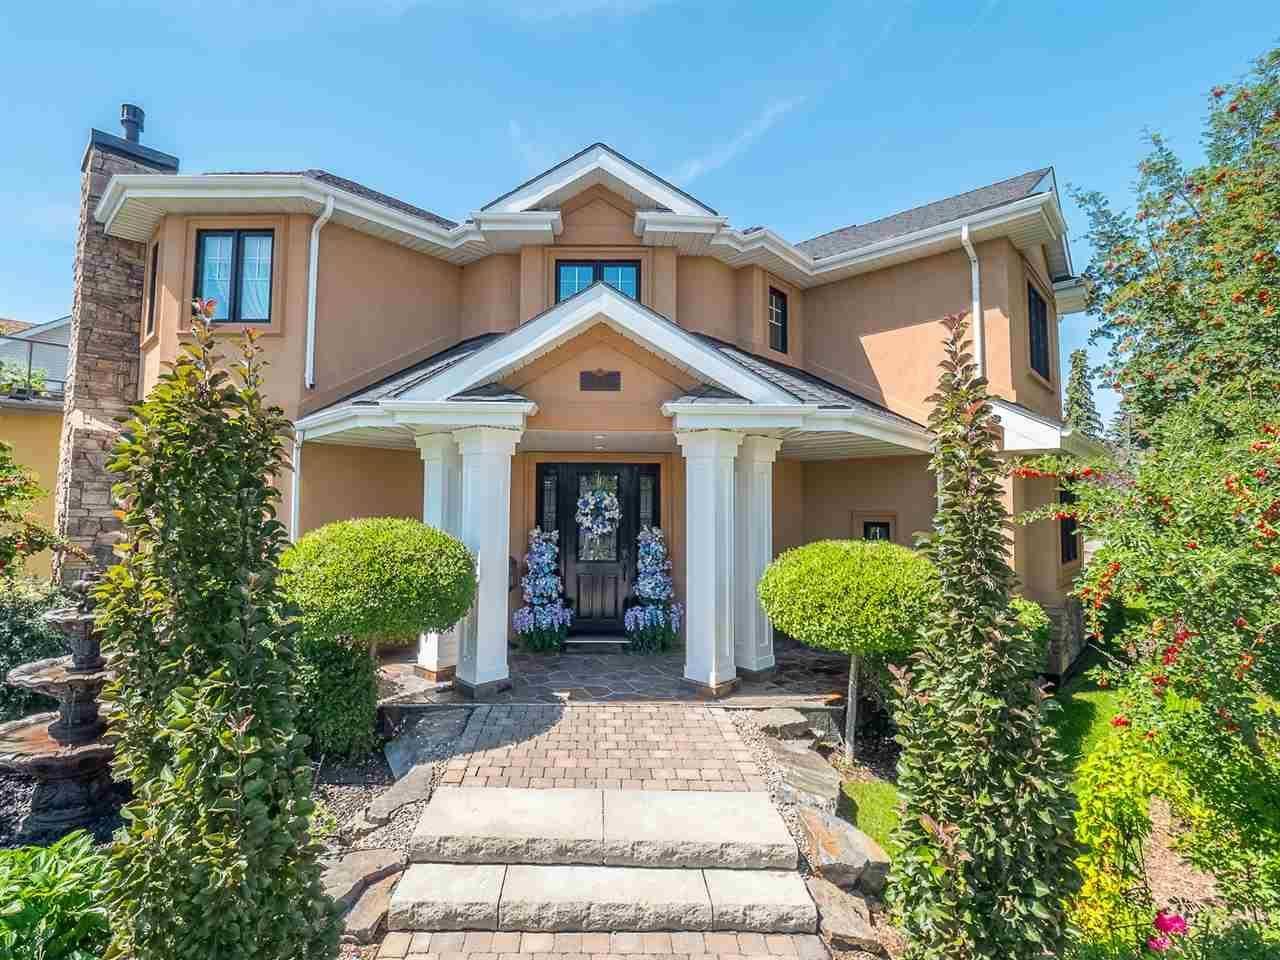 House for sale at 104 Saskatchewan Dr Nw Edmonton Alberta - MLS: E4170321